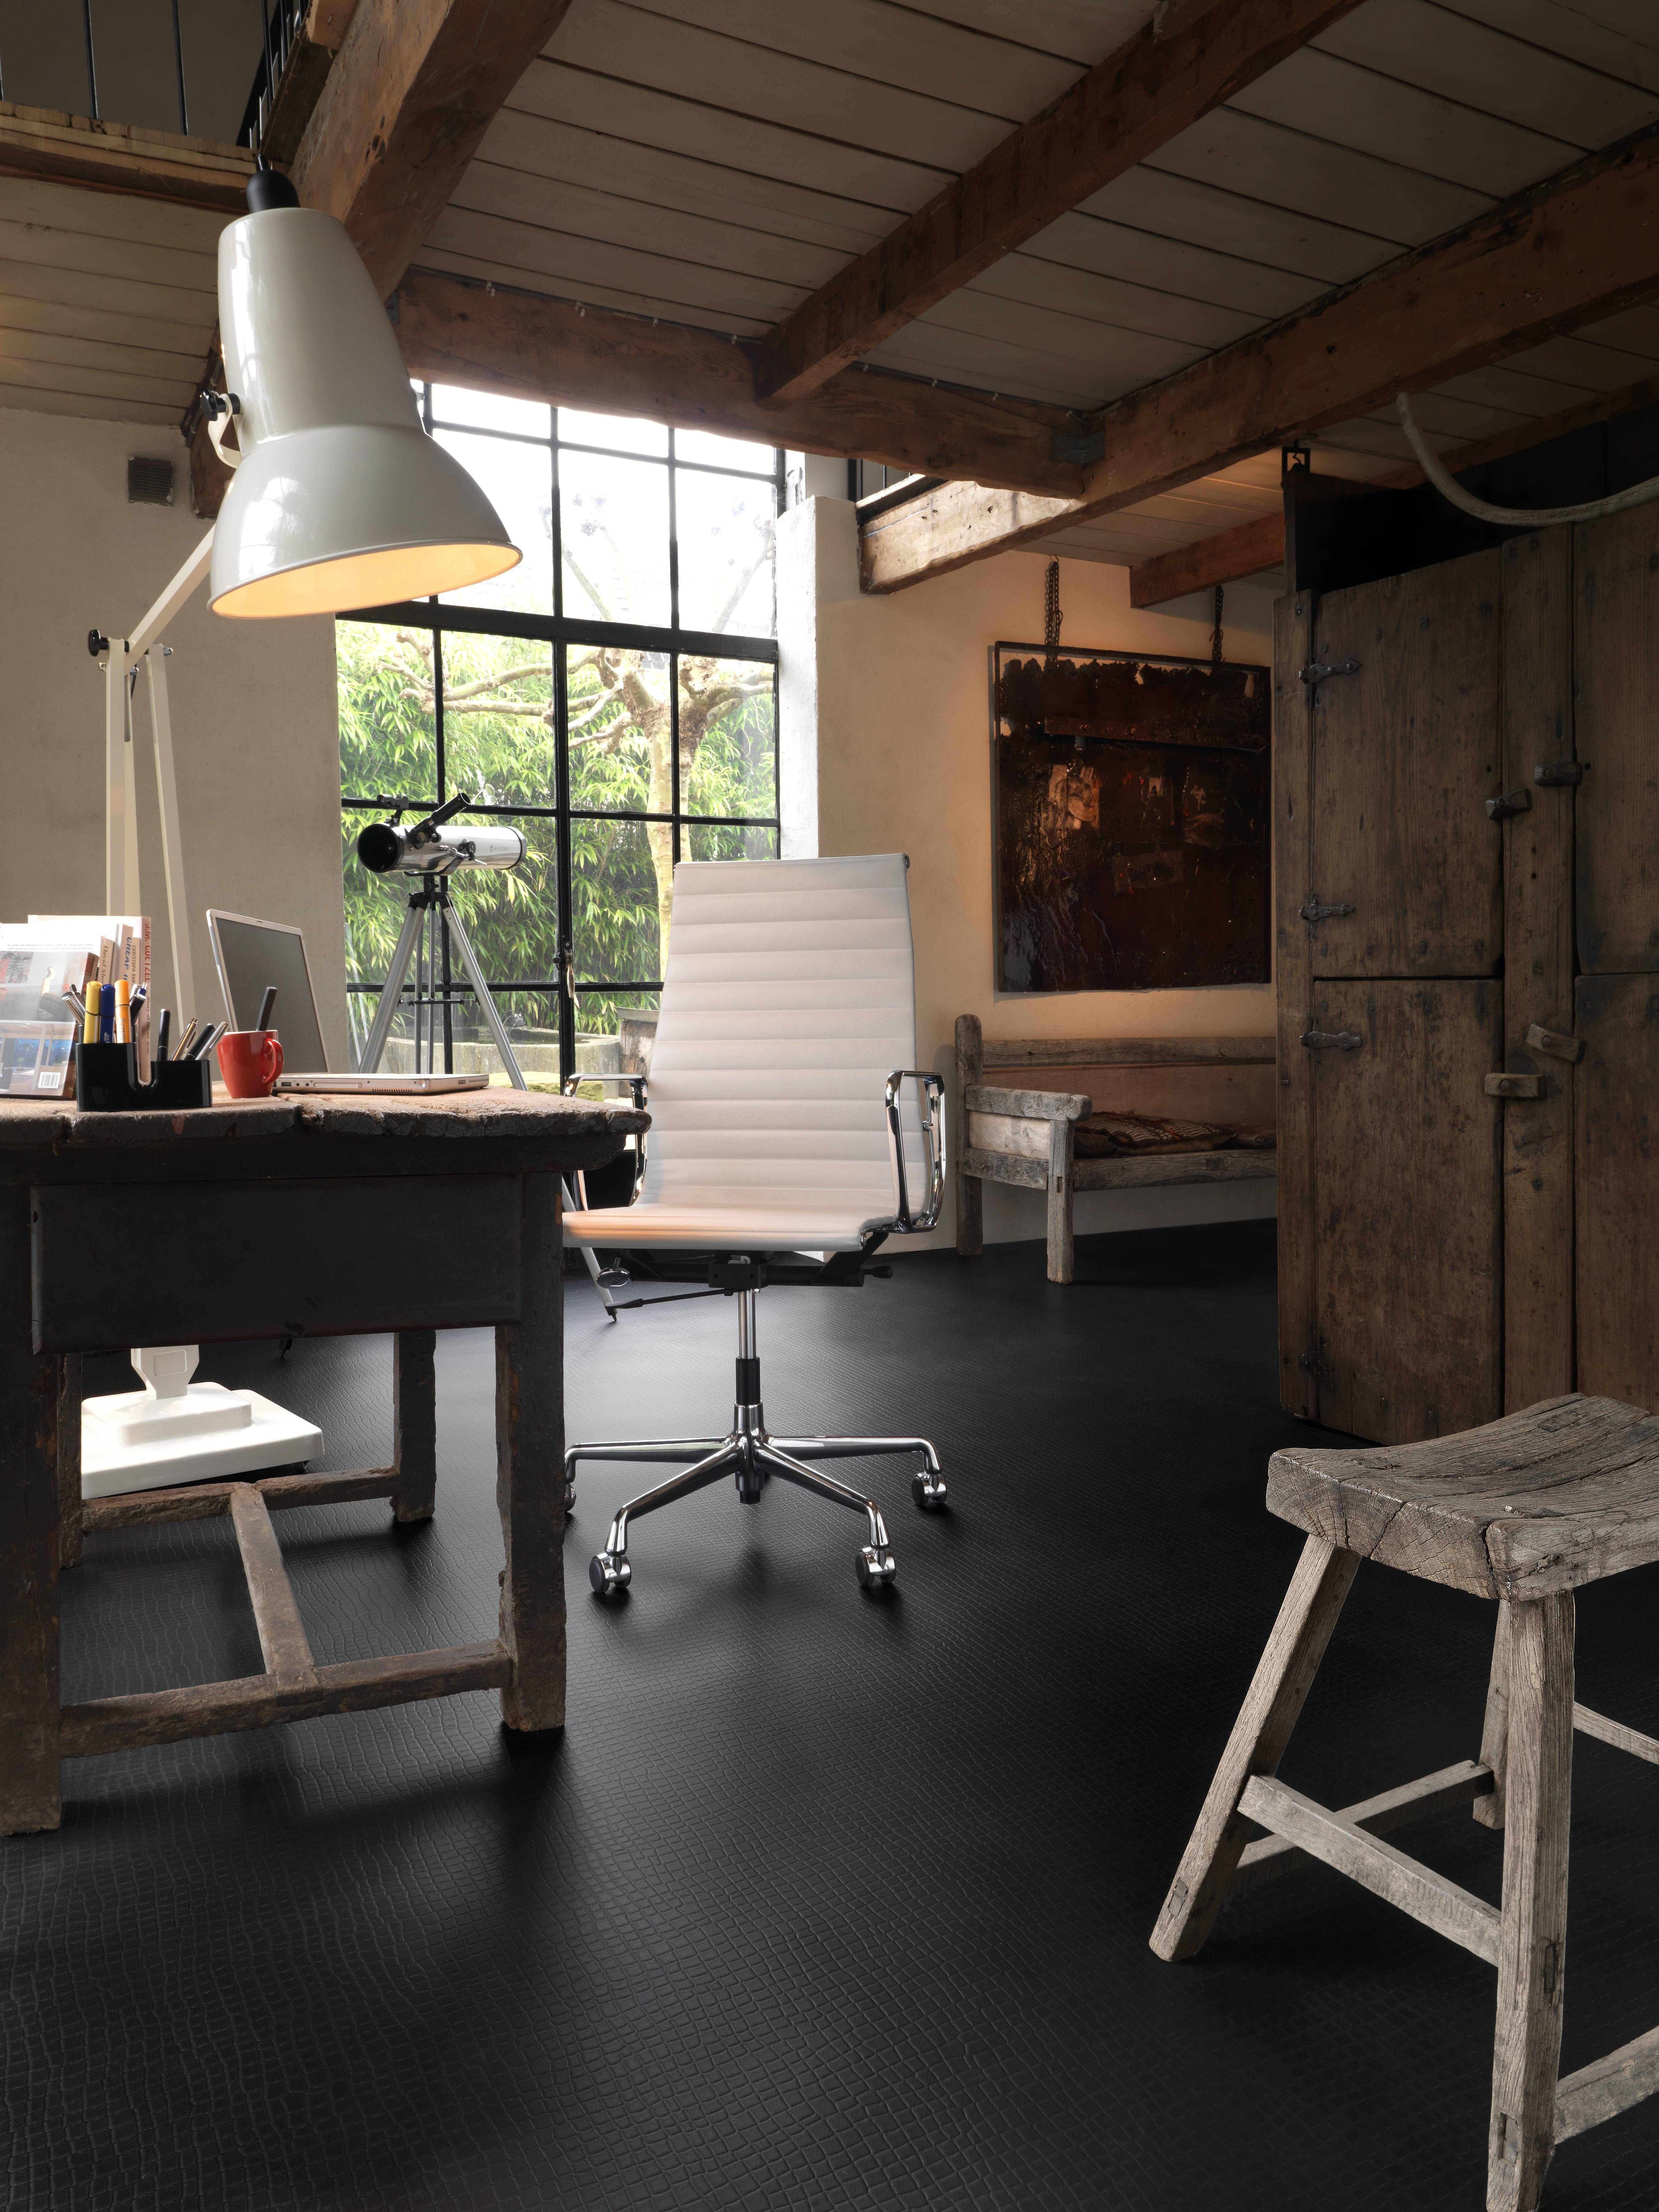 forbo flooring, marmoleum styling, wieteke faaij photography